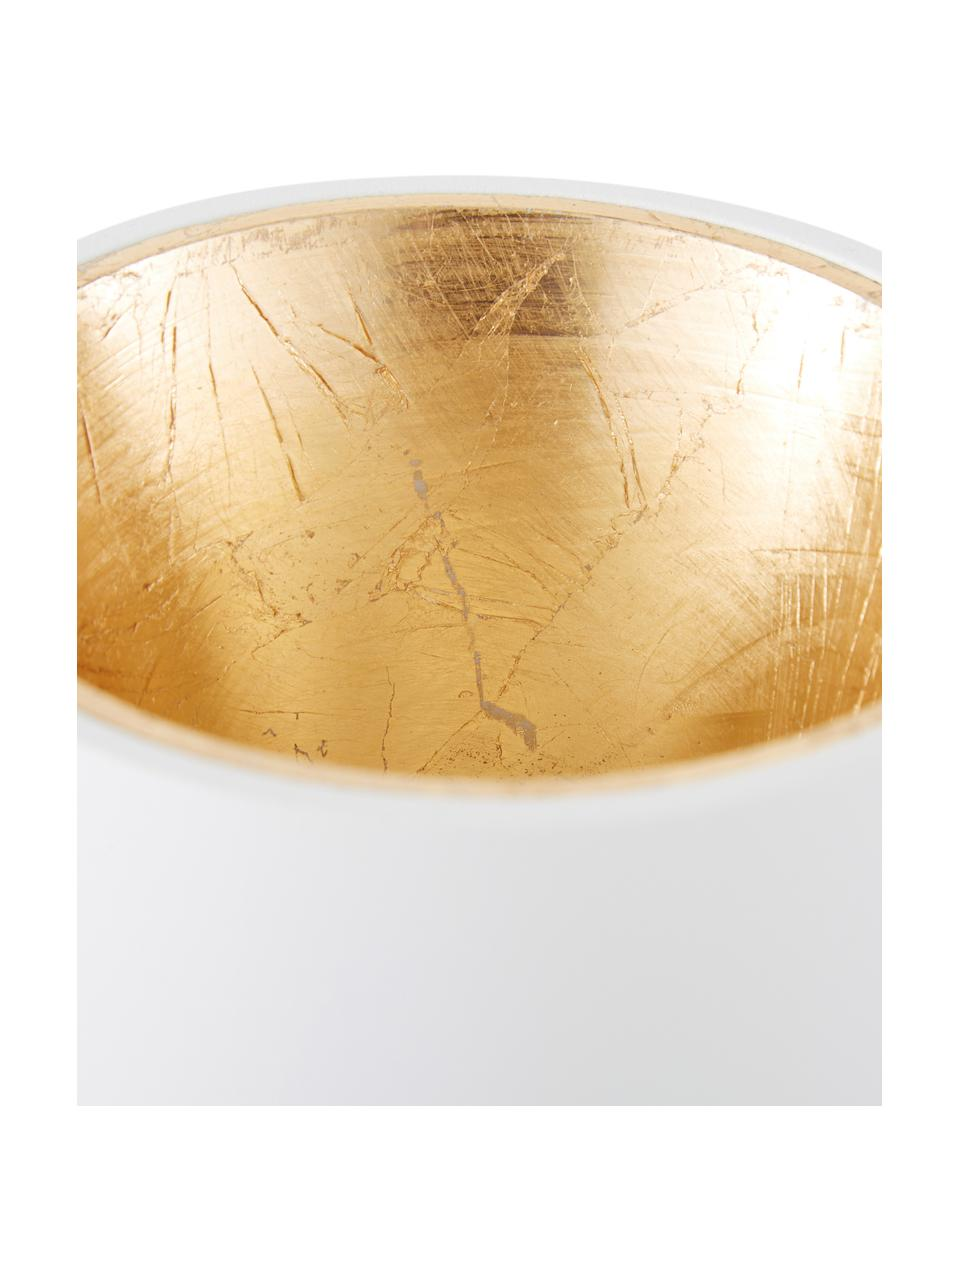 LED plafondspot Marty, Wit, goudkleurig, Ø 10 x H 12 cm